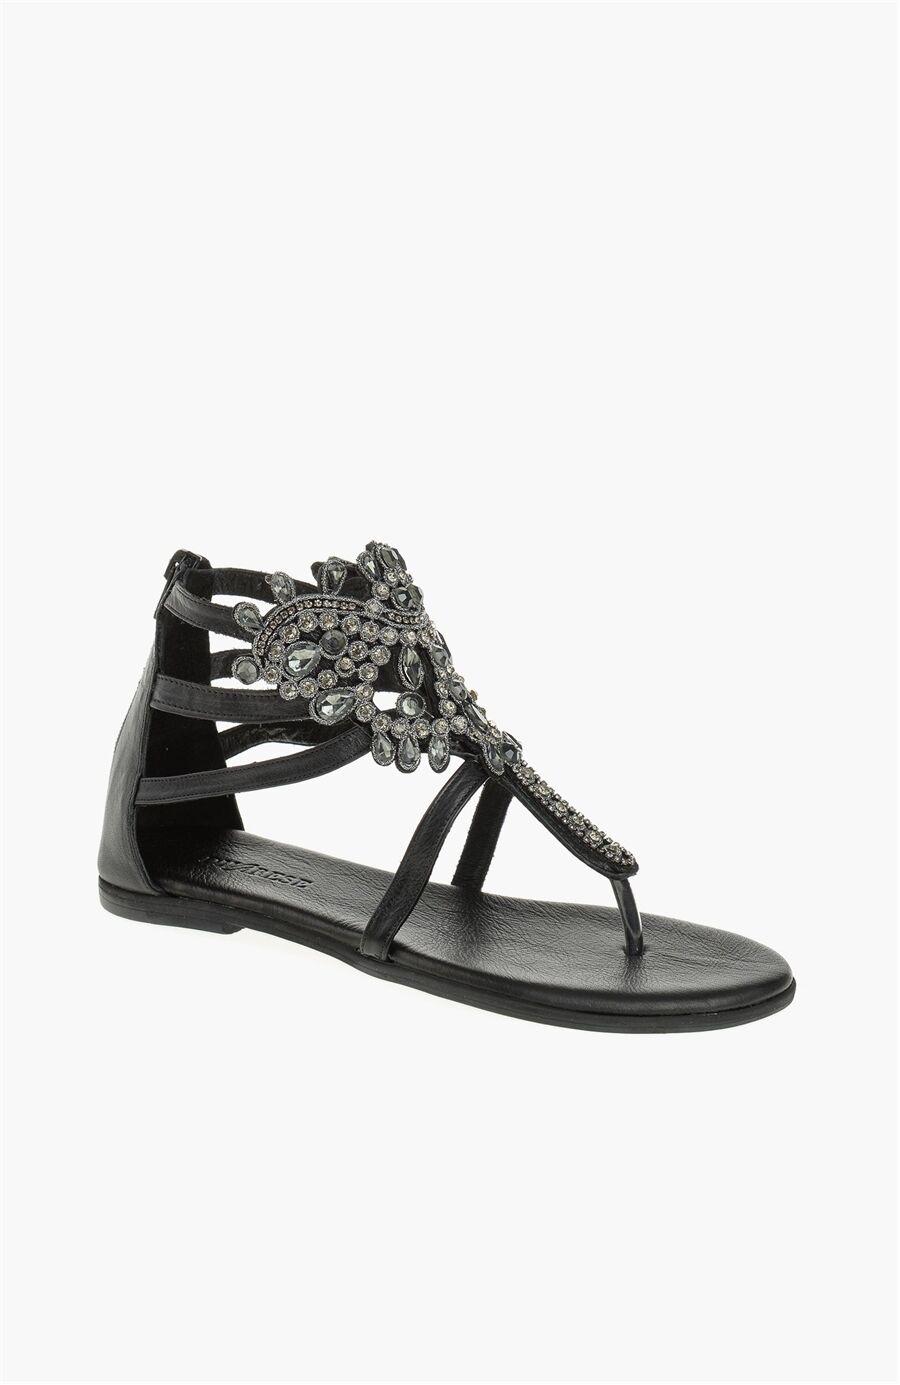 Dıvarese Select Siyah Sandalet – 259.0 TL